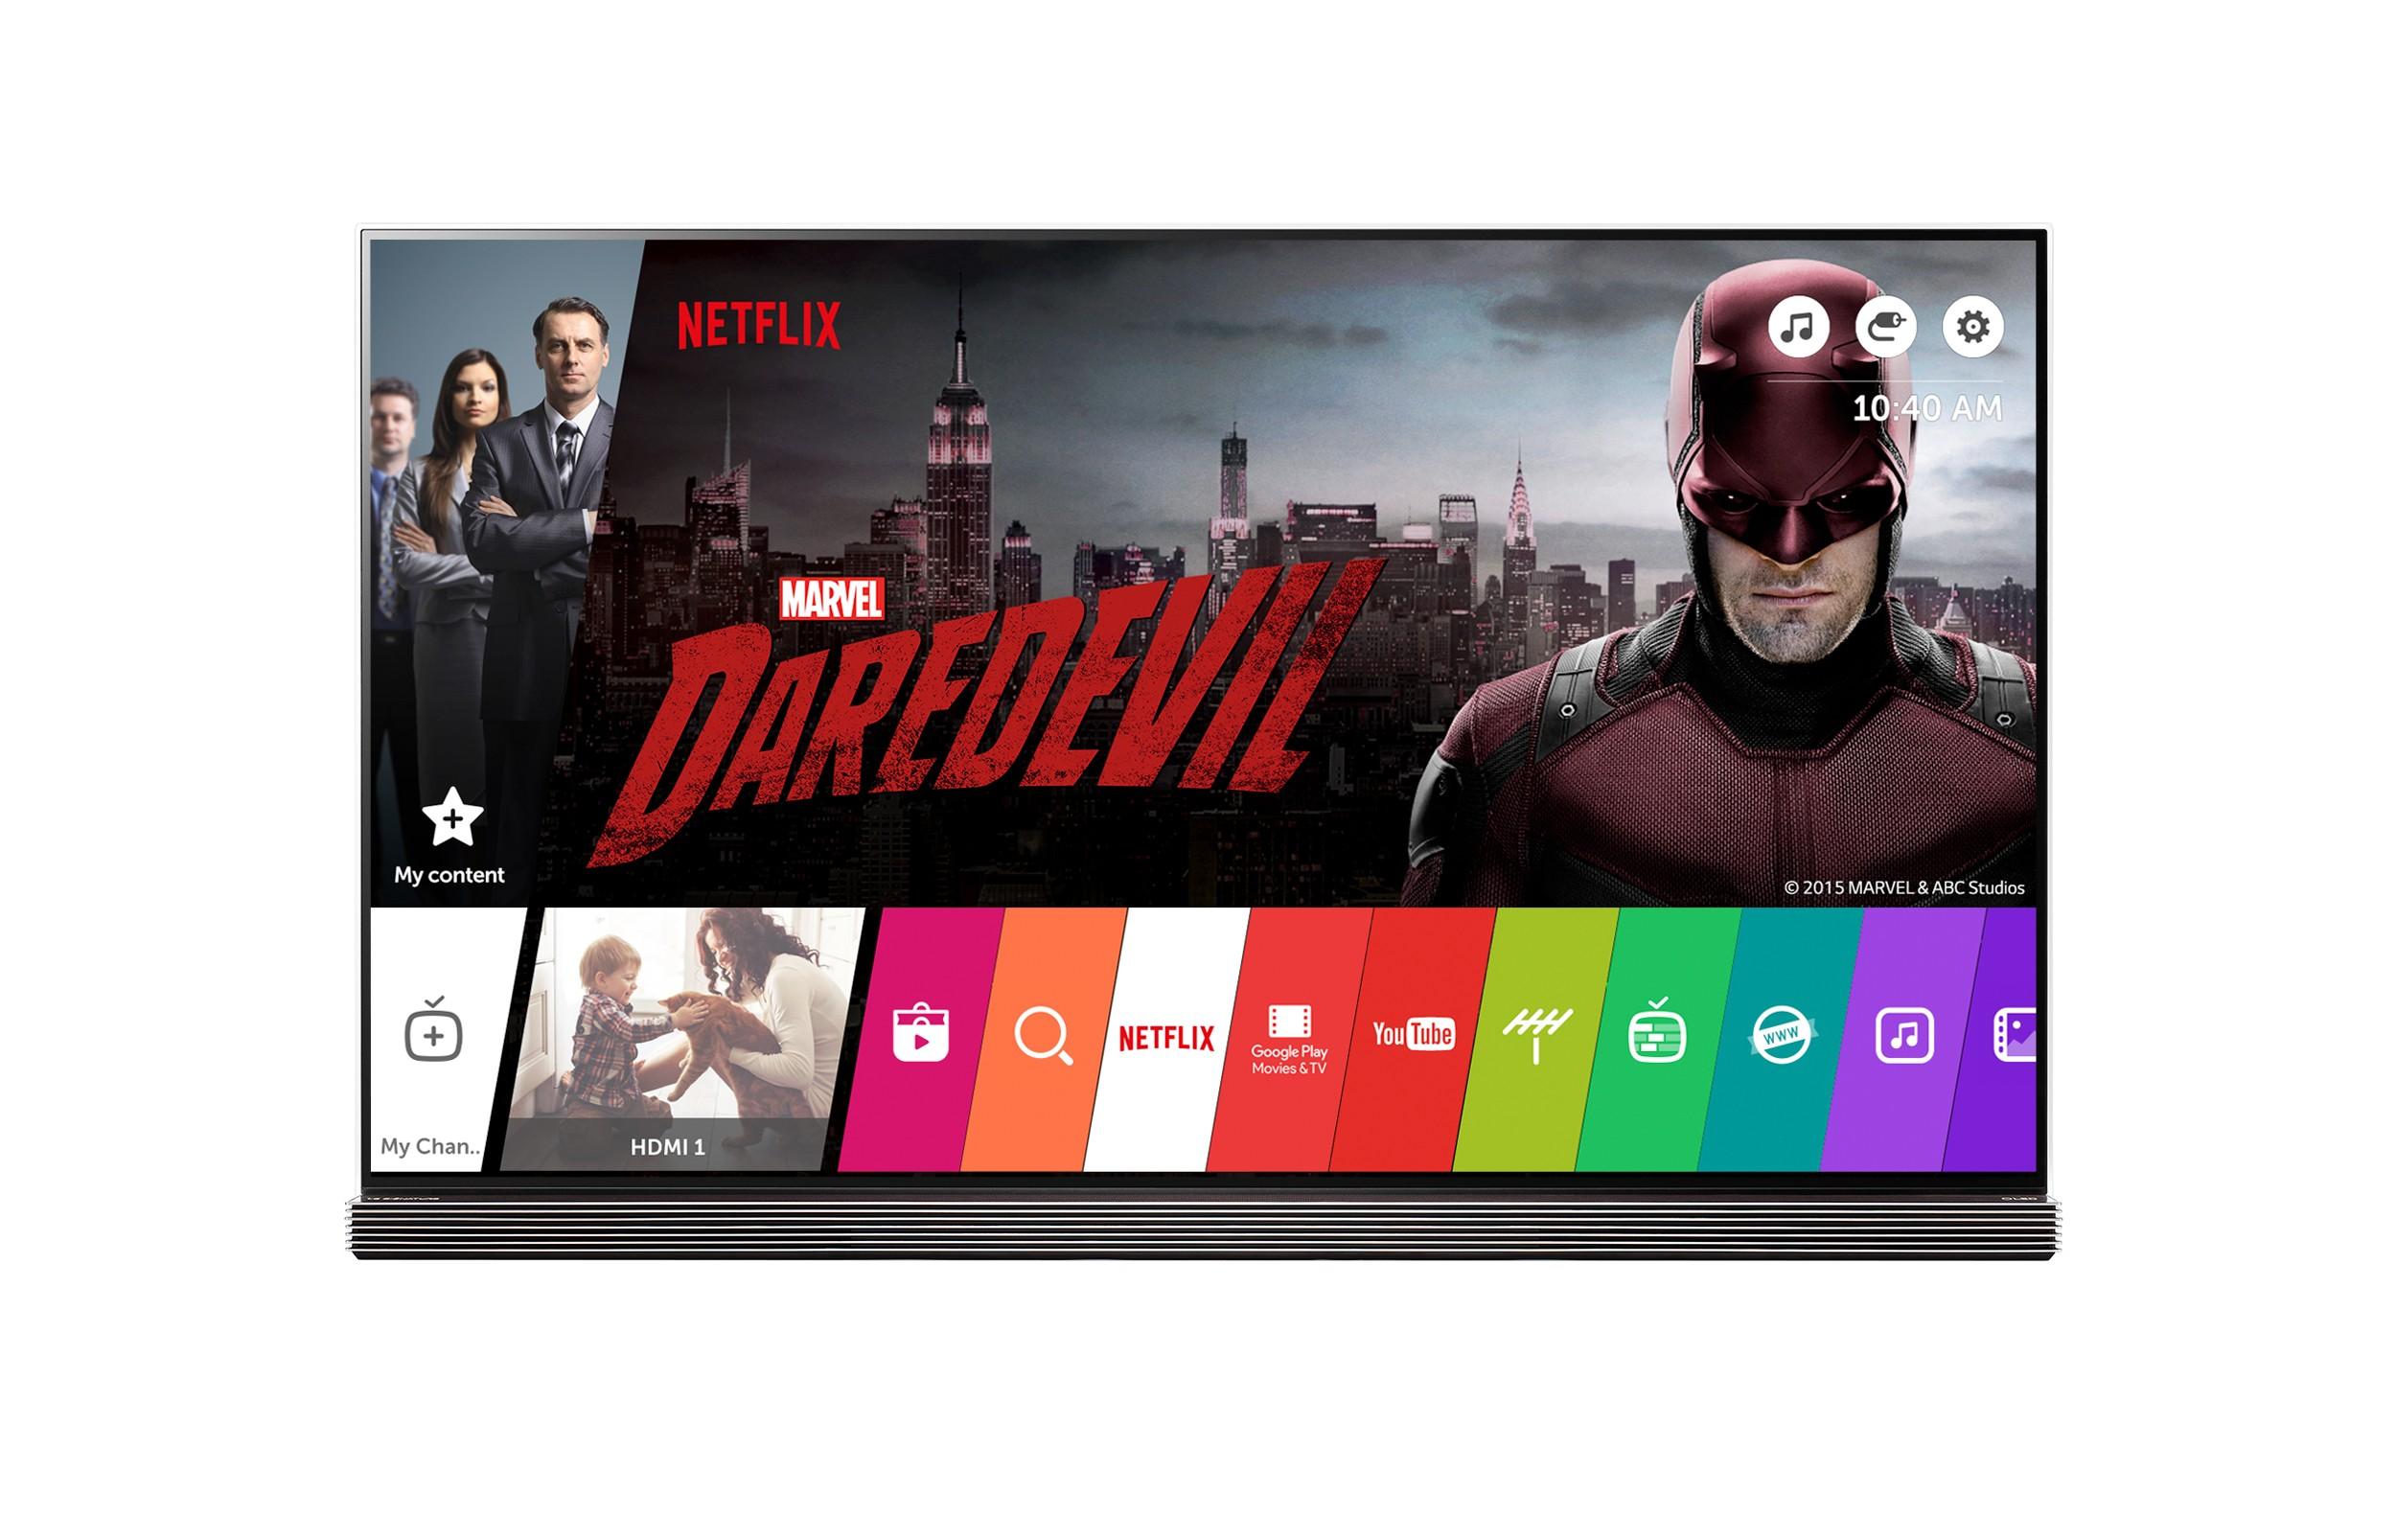 LG-Netflix-Partnership